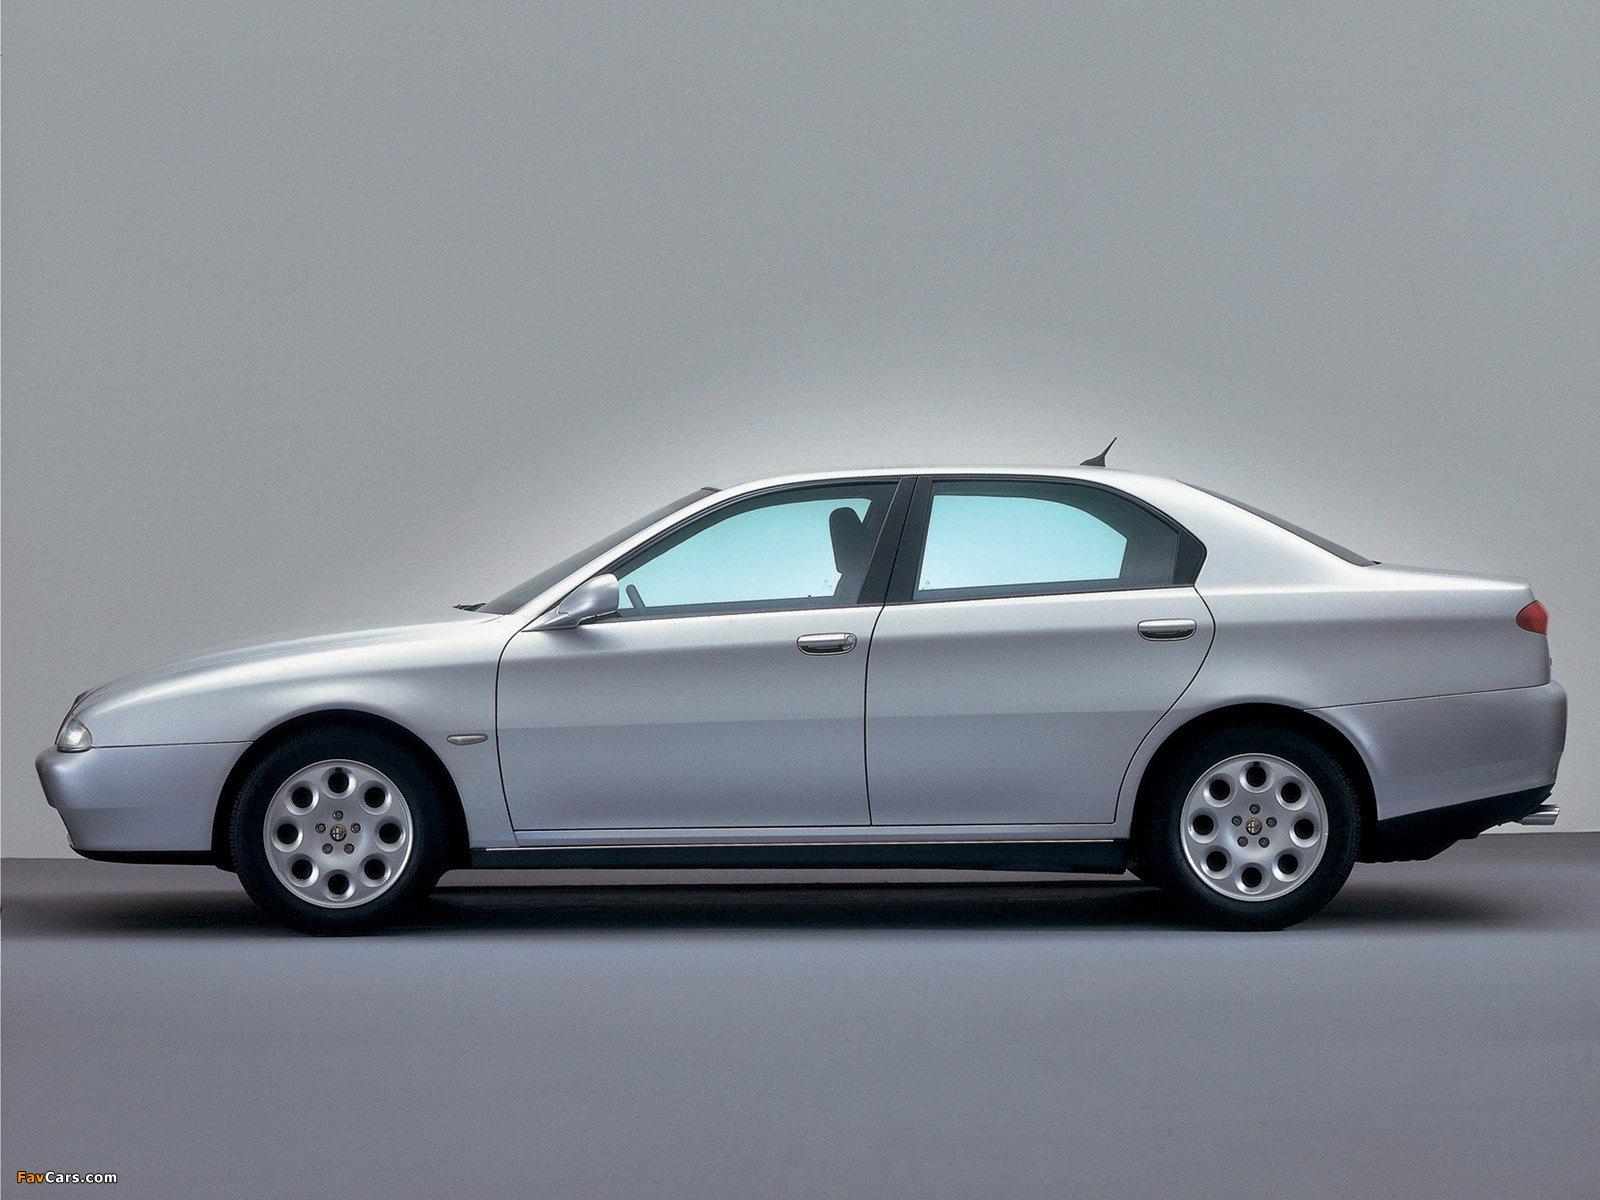 Pictures Of Alfa Romeo 166 936 1998 2003 1600x1200